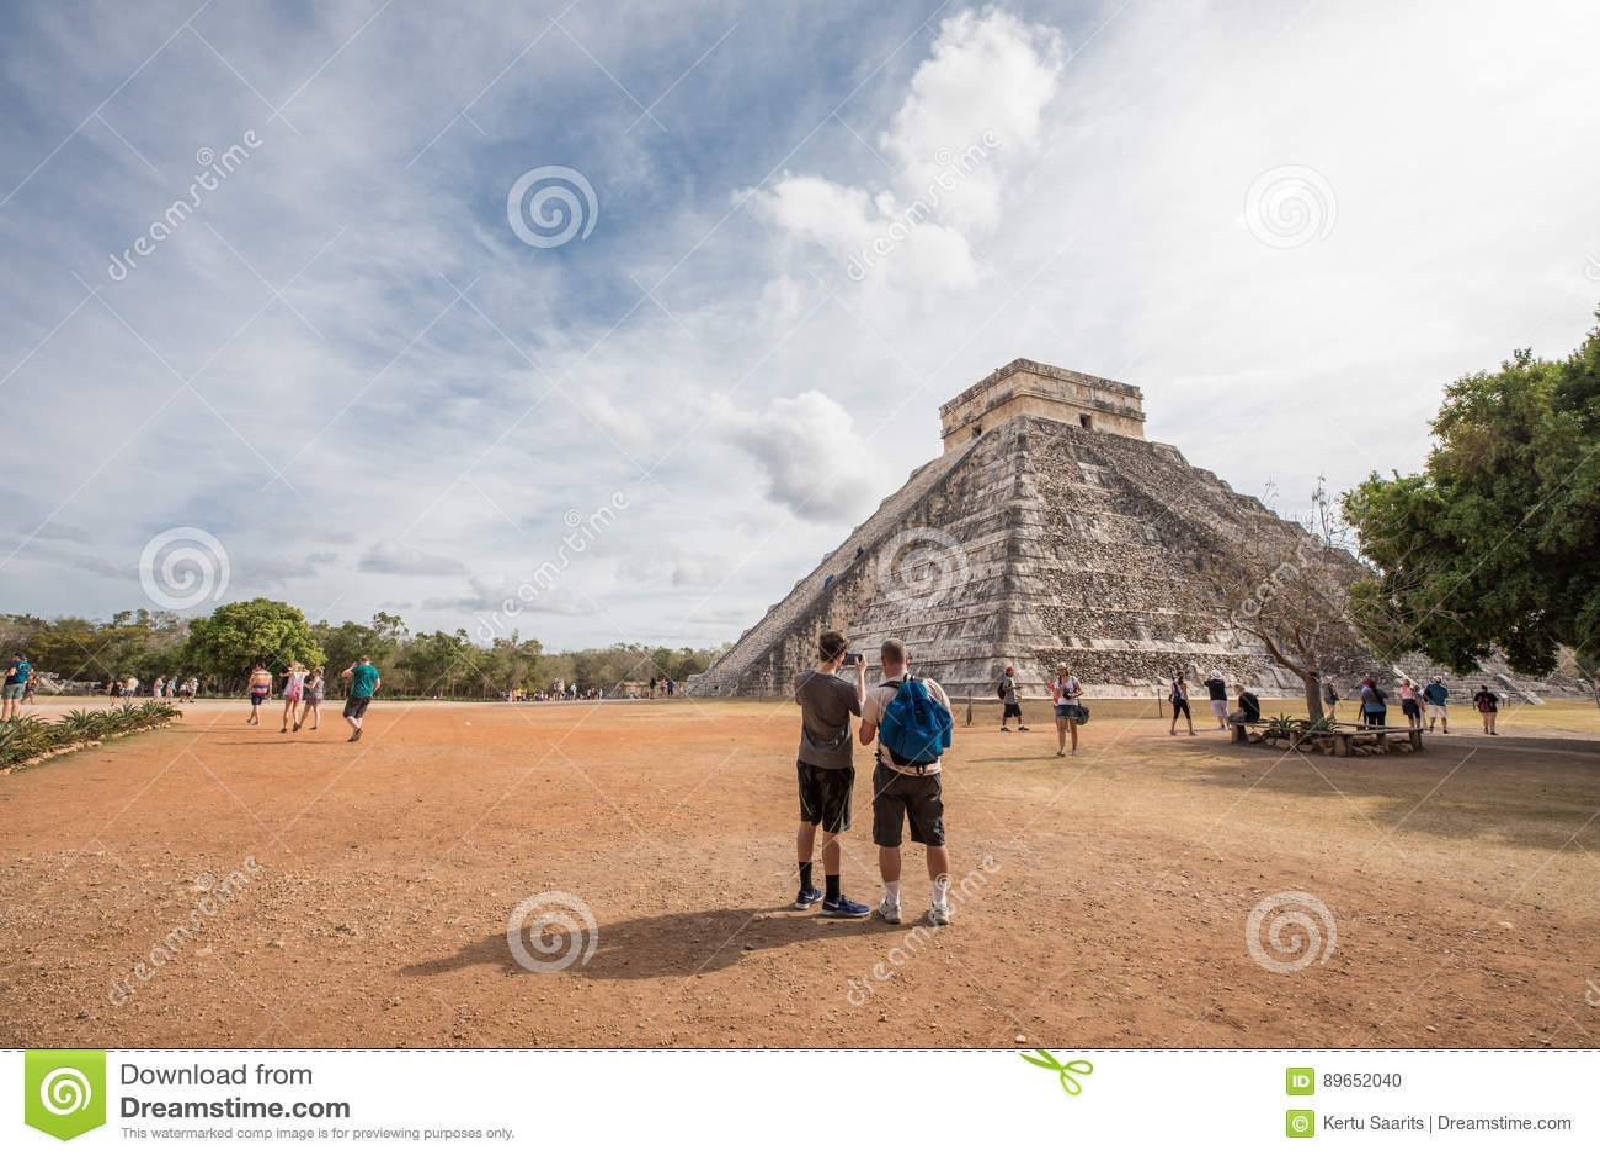 Tourists at Chichen Itza.